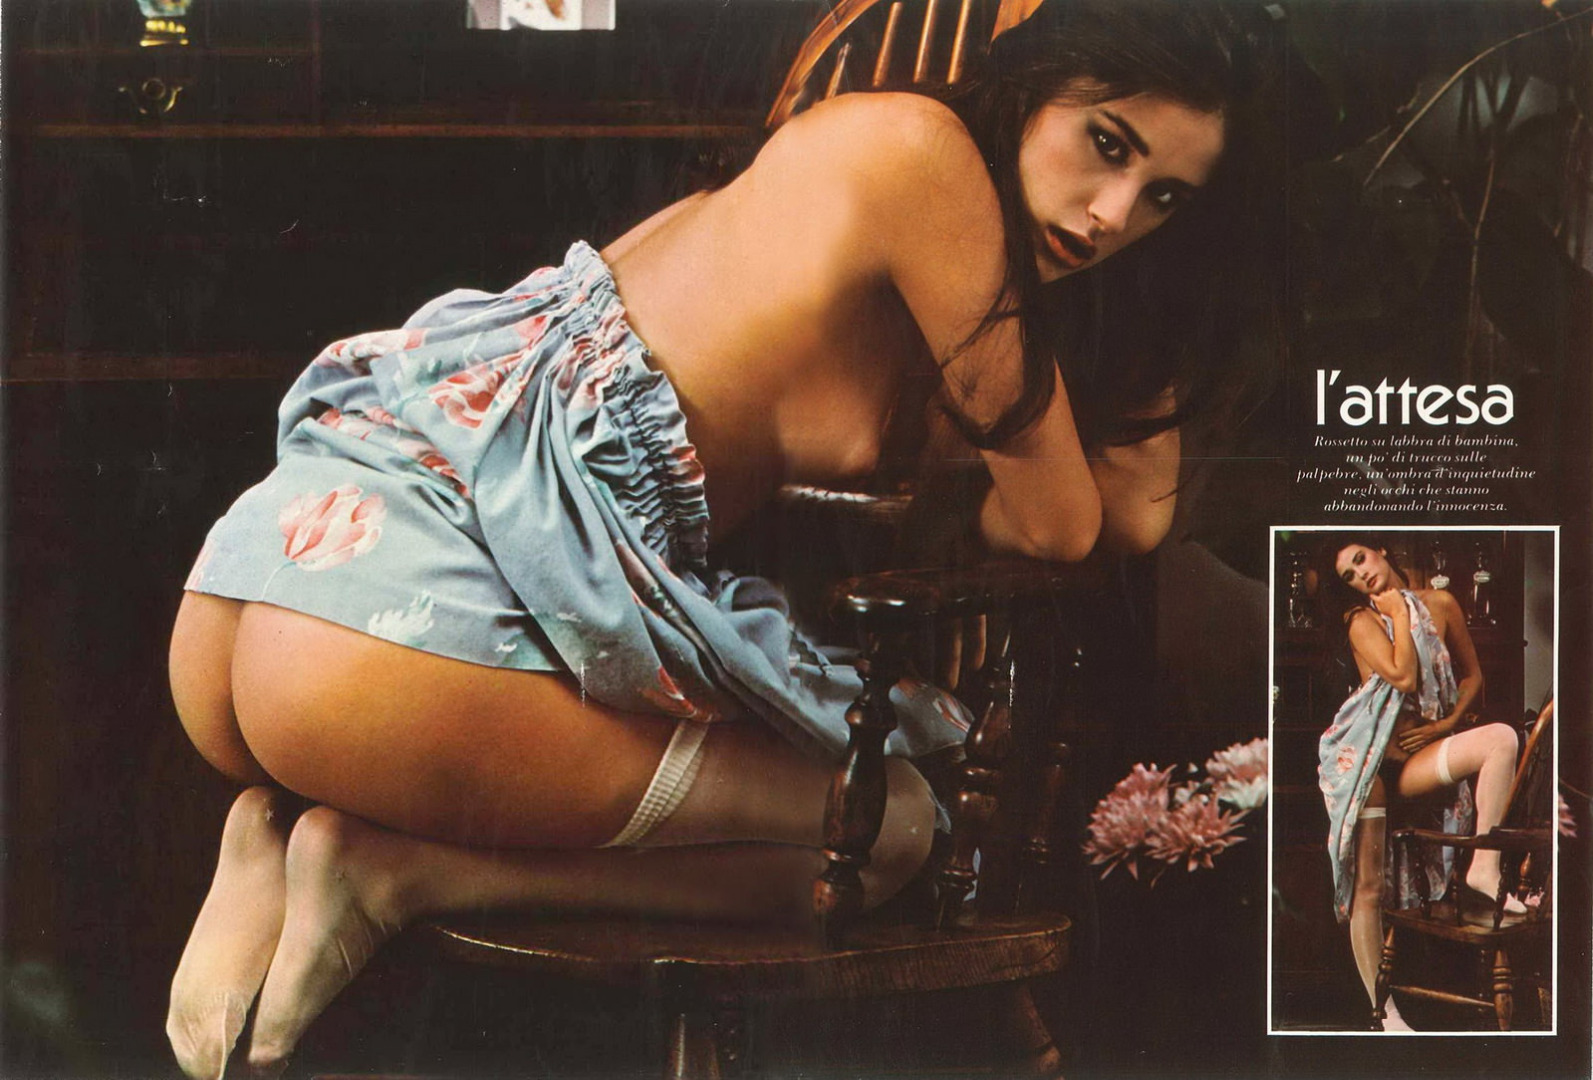 Demi moore upskirt hot pics, very very small naked irani girl